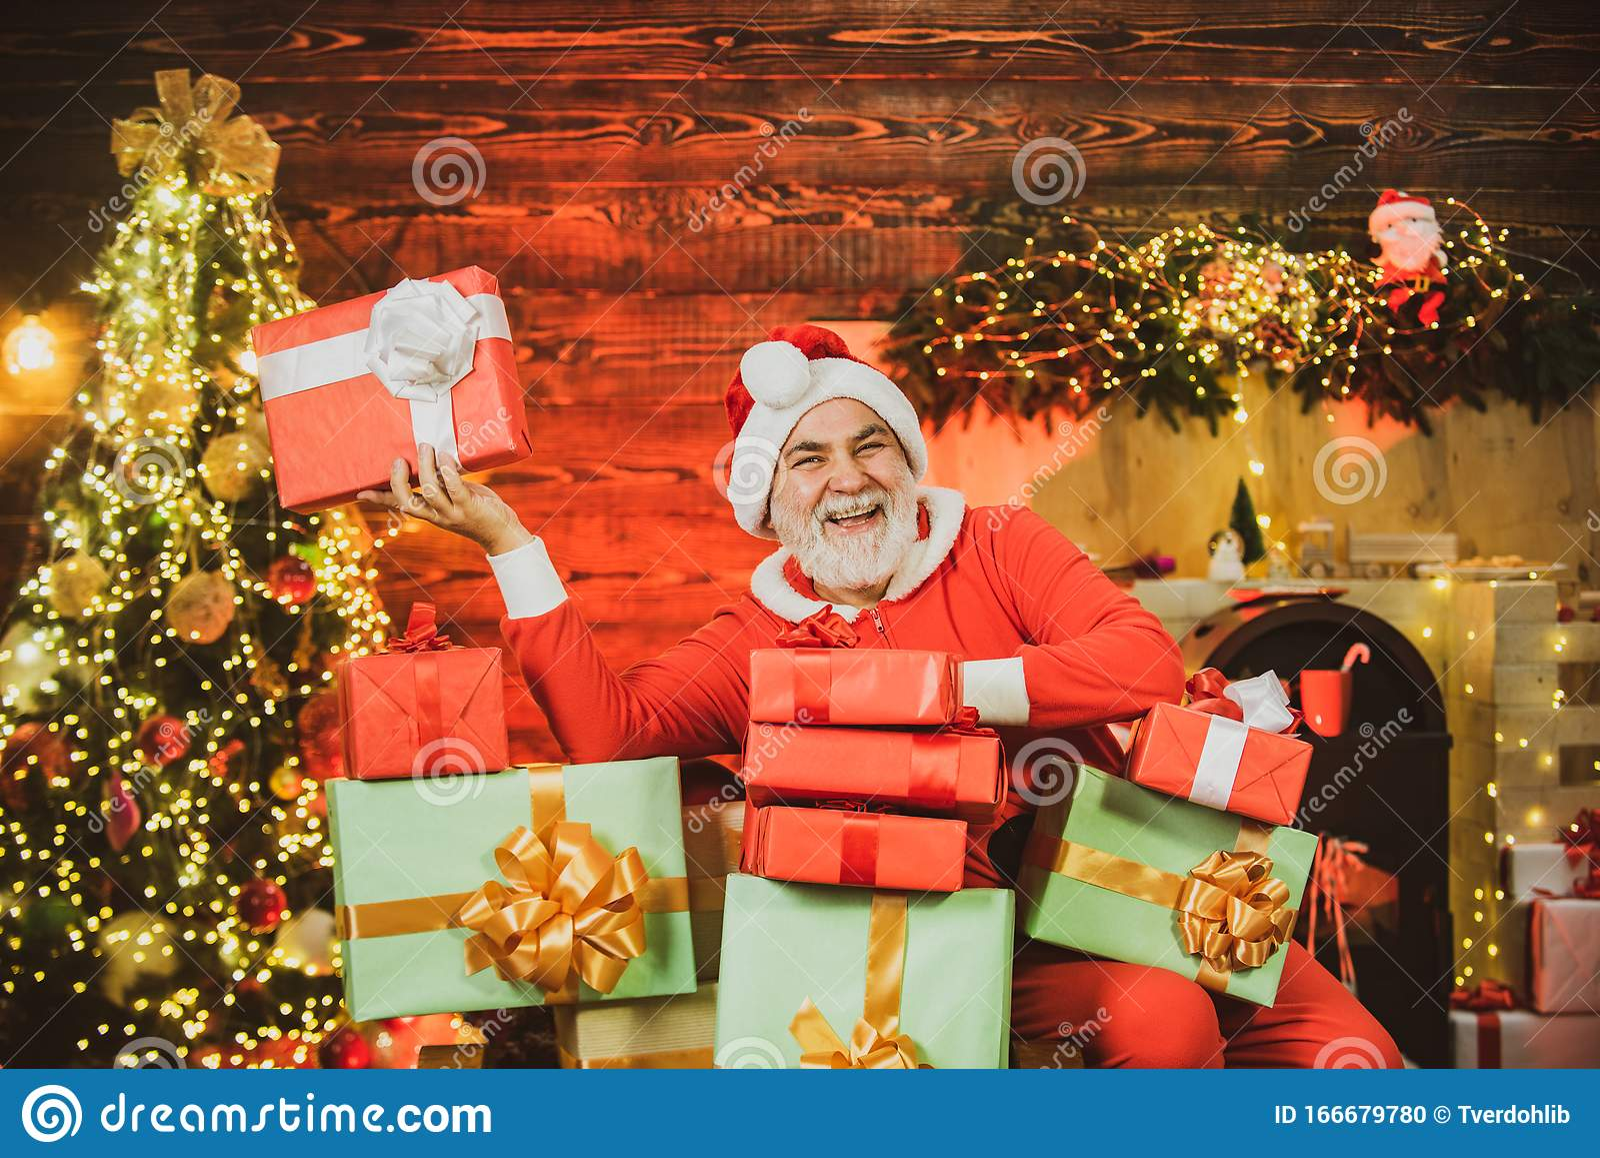 Funny Santa Hold Christmas Gift Santa Wishes Merry Christmas Stock Photo Image Of Christmas Merry 166679780